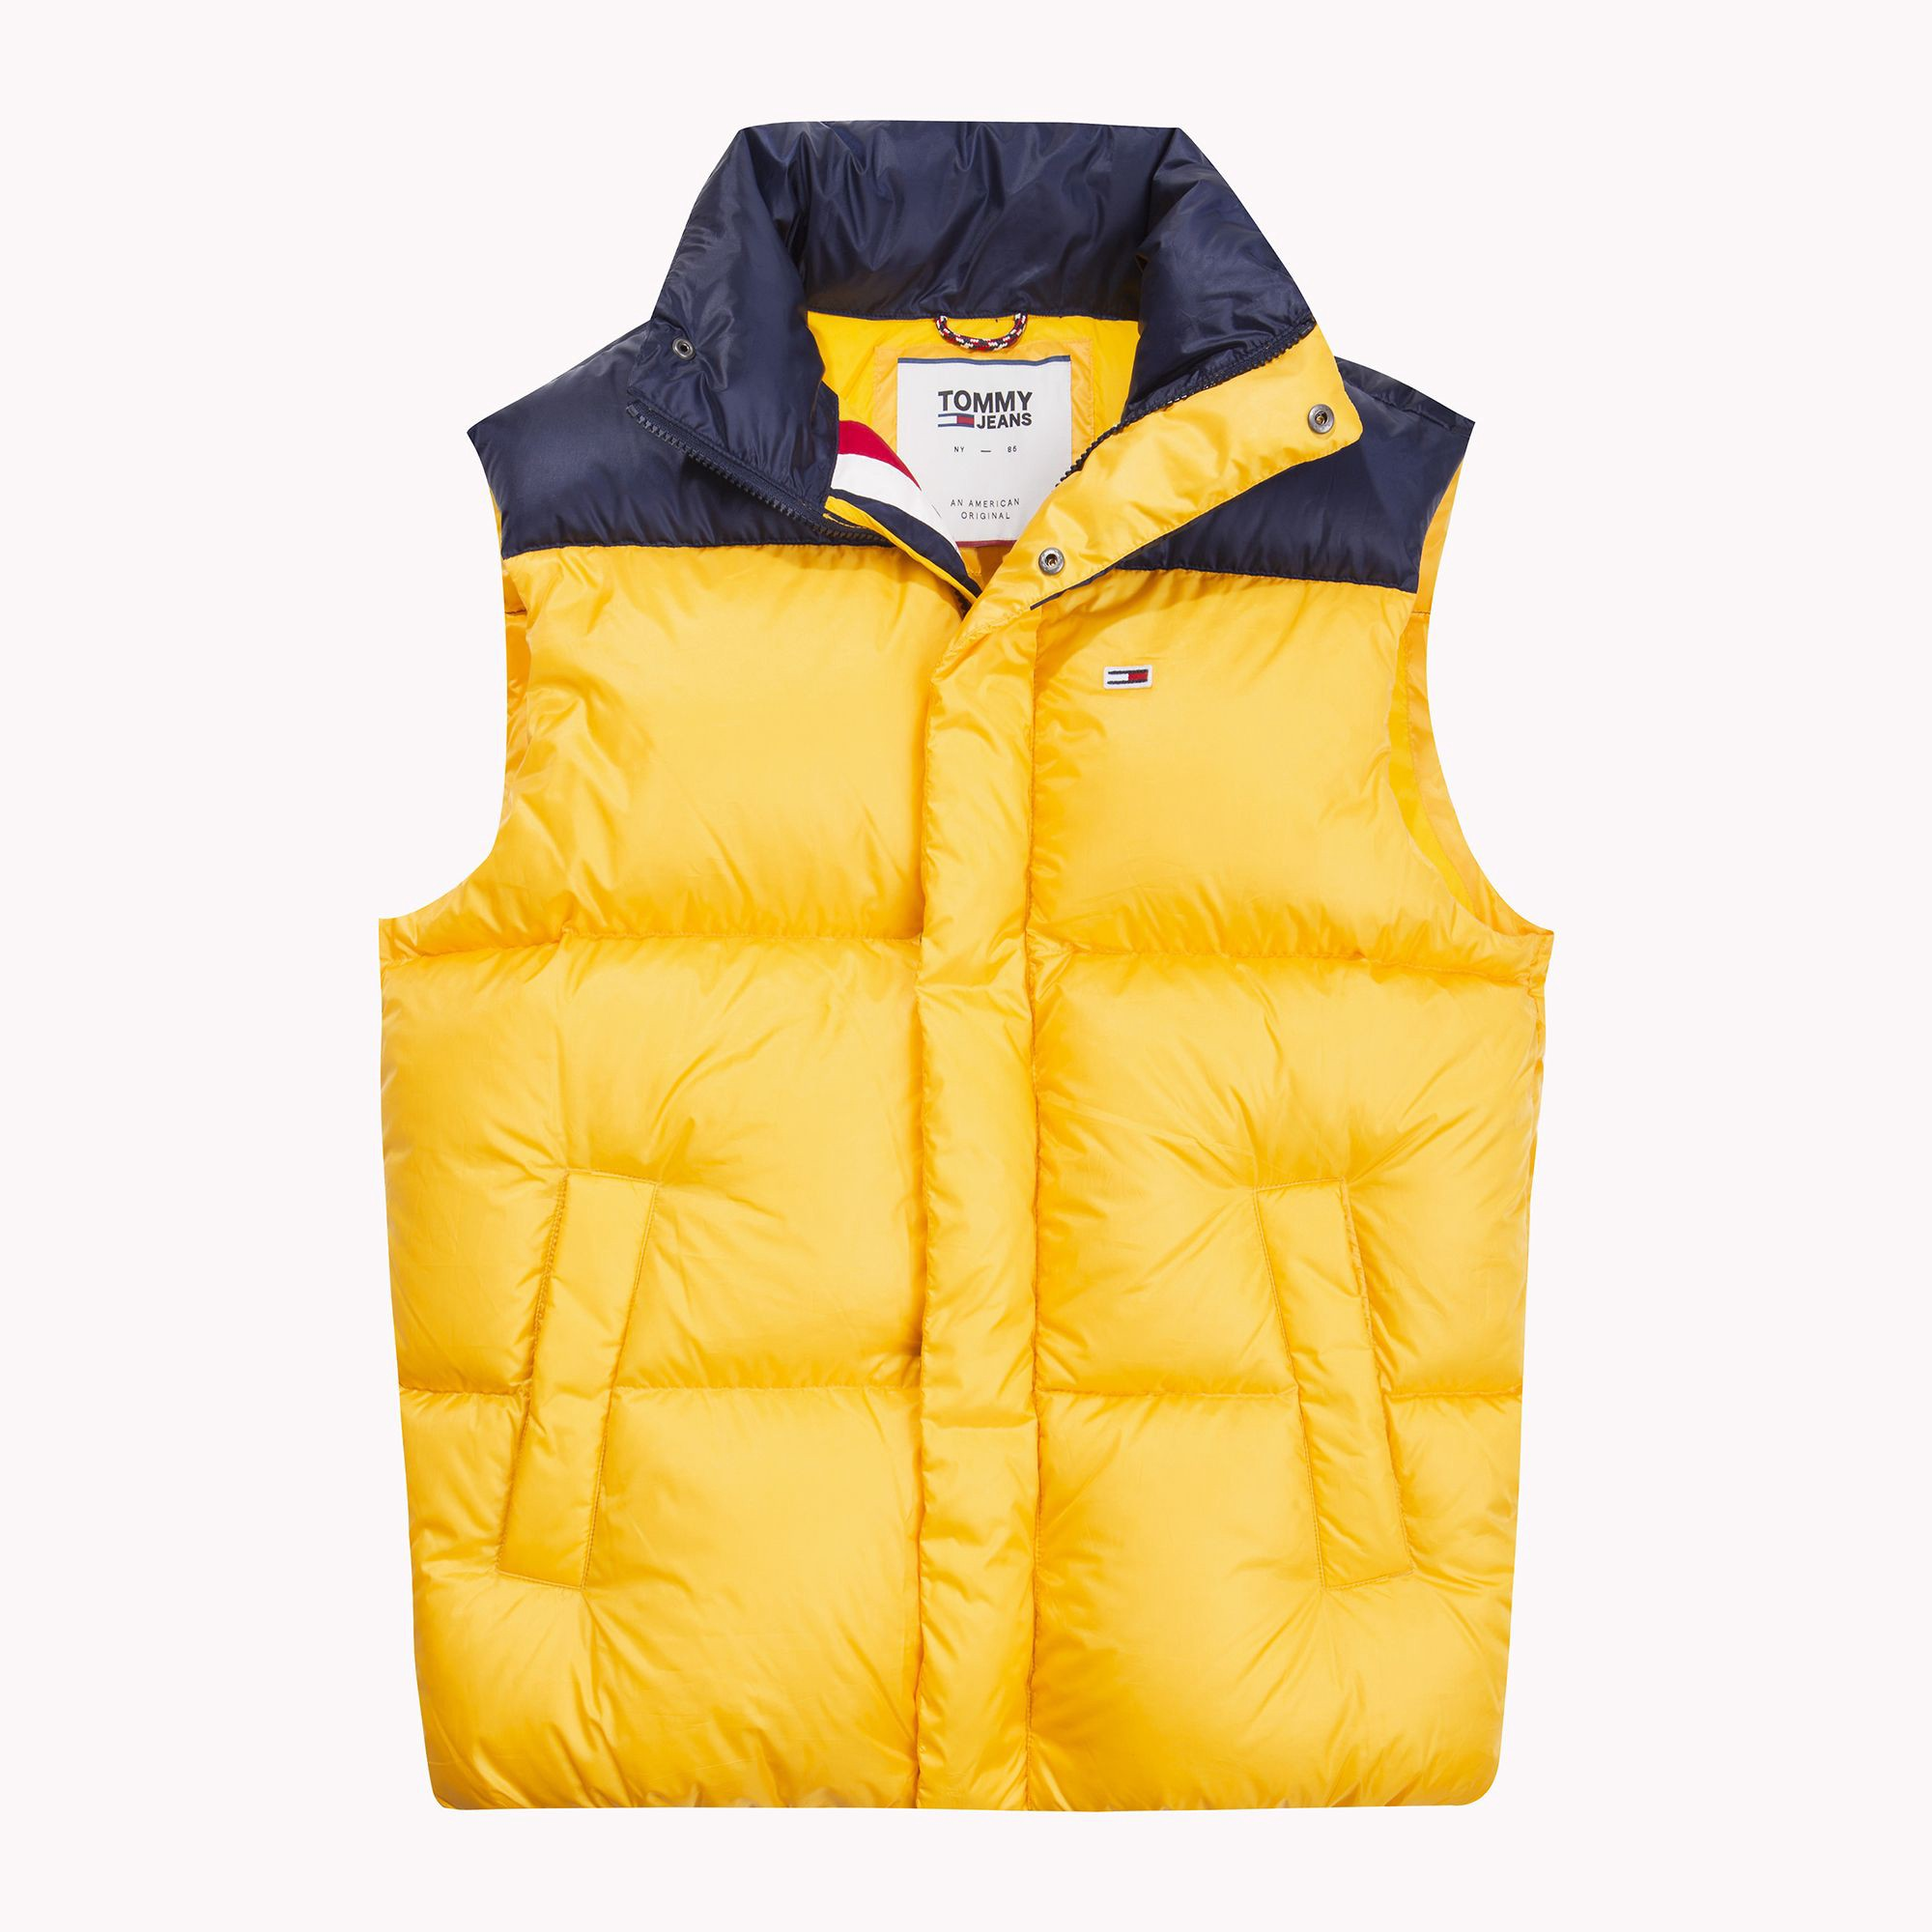 Tommy Hilfiger Classics Vest Samba Black Iris S Kids Jacket Tommy Hilfiger Tommy Hilfiger Man